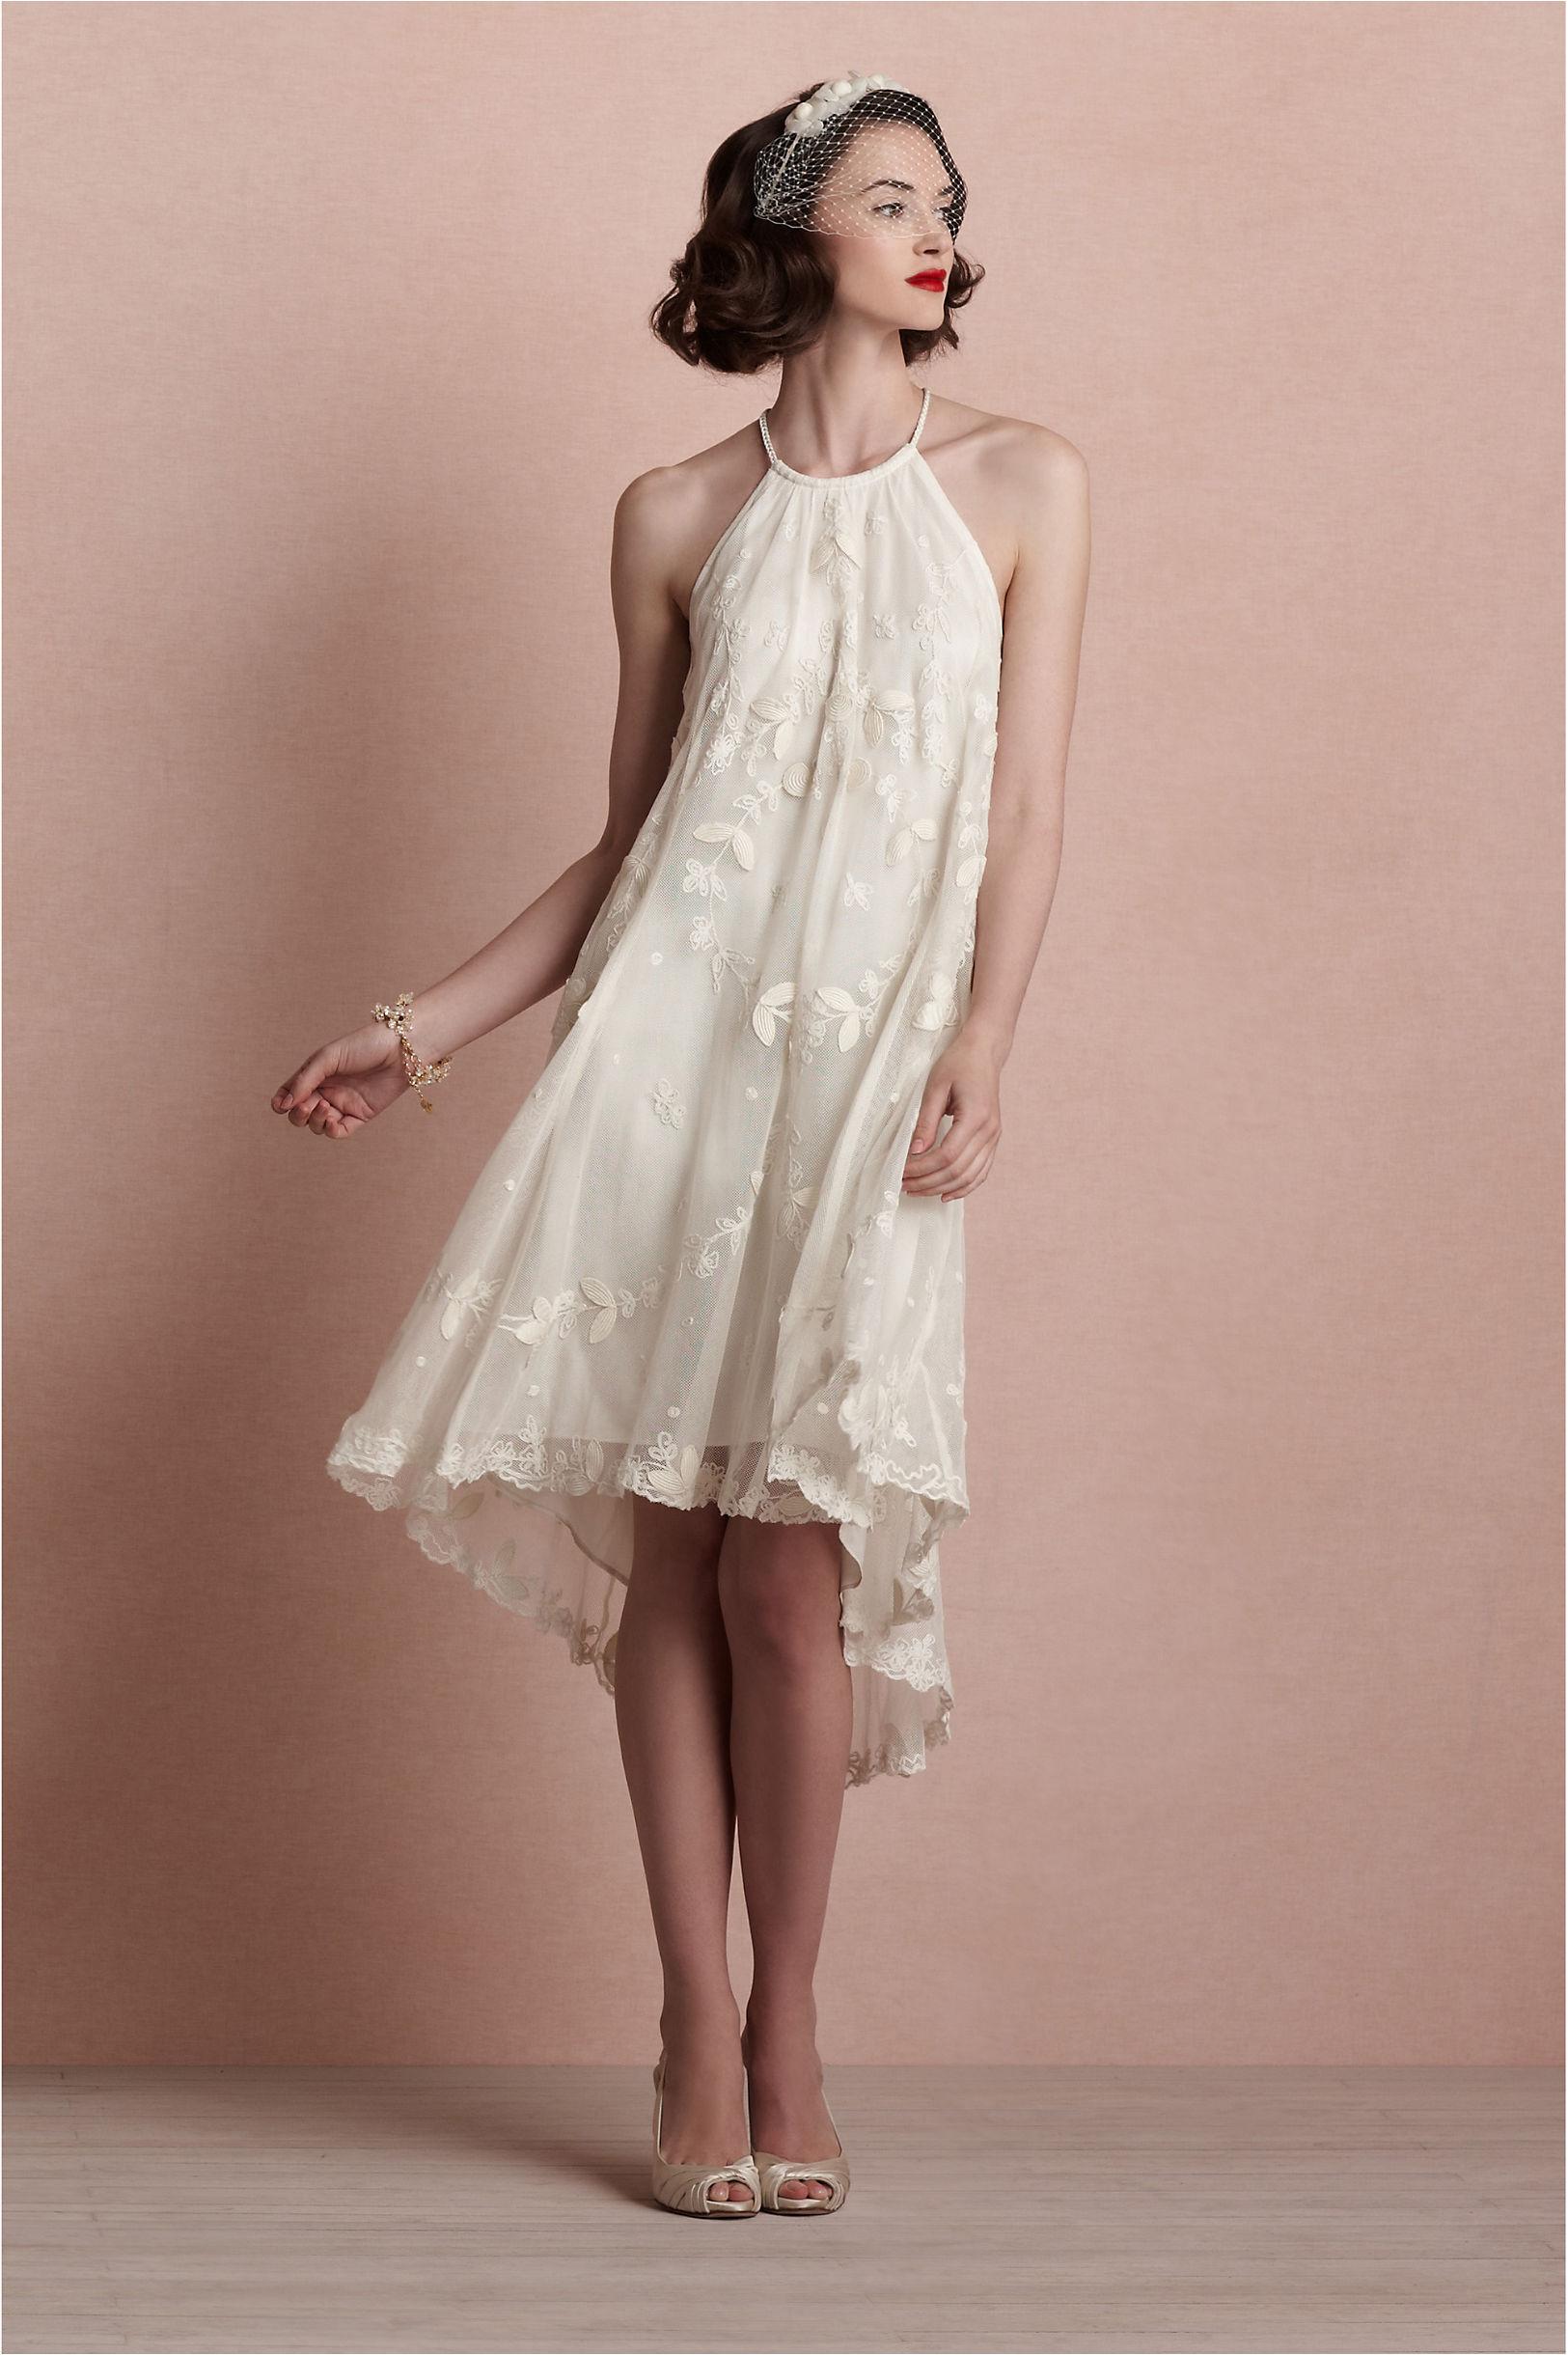 Kauai Dress in Bride | BHLDN